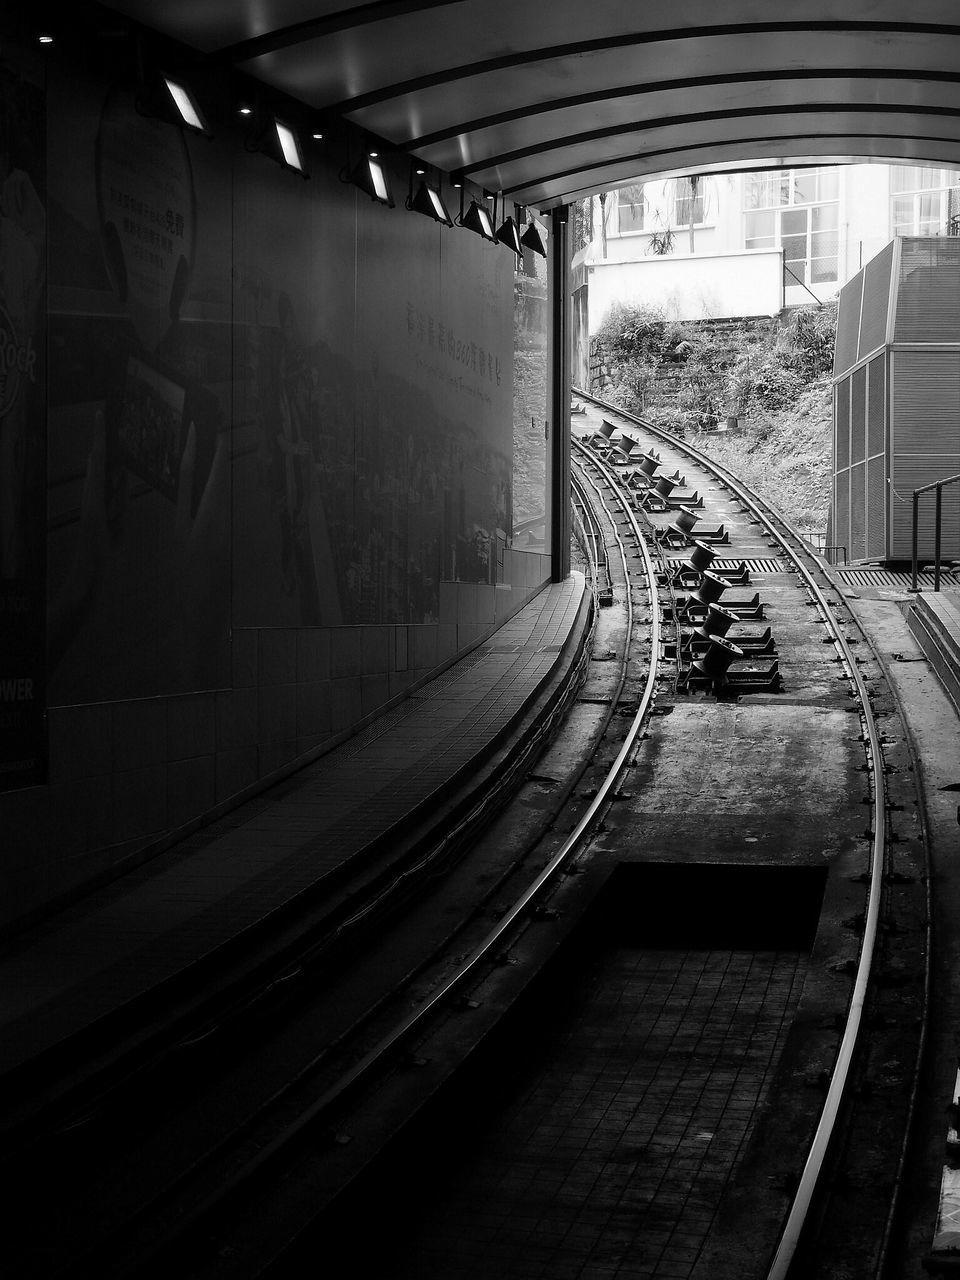 transportation, rail transportation, railroad track, public transportation, architecture, built structure, no people, day, outdoors